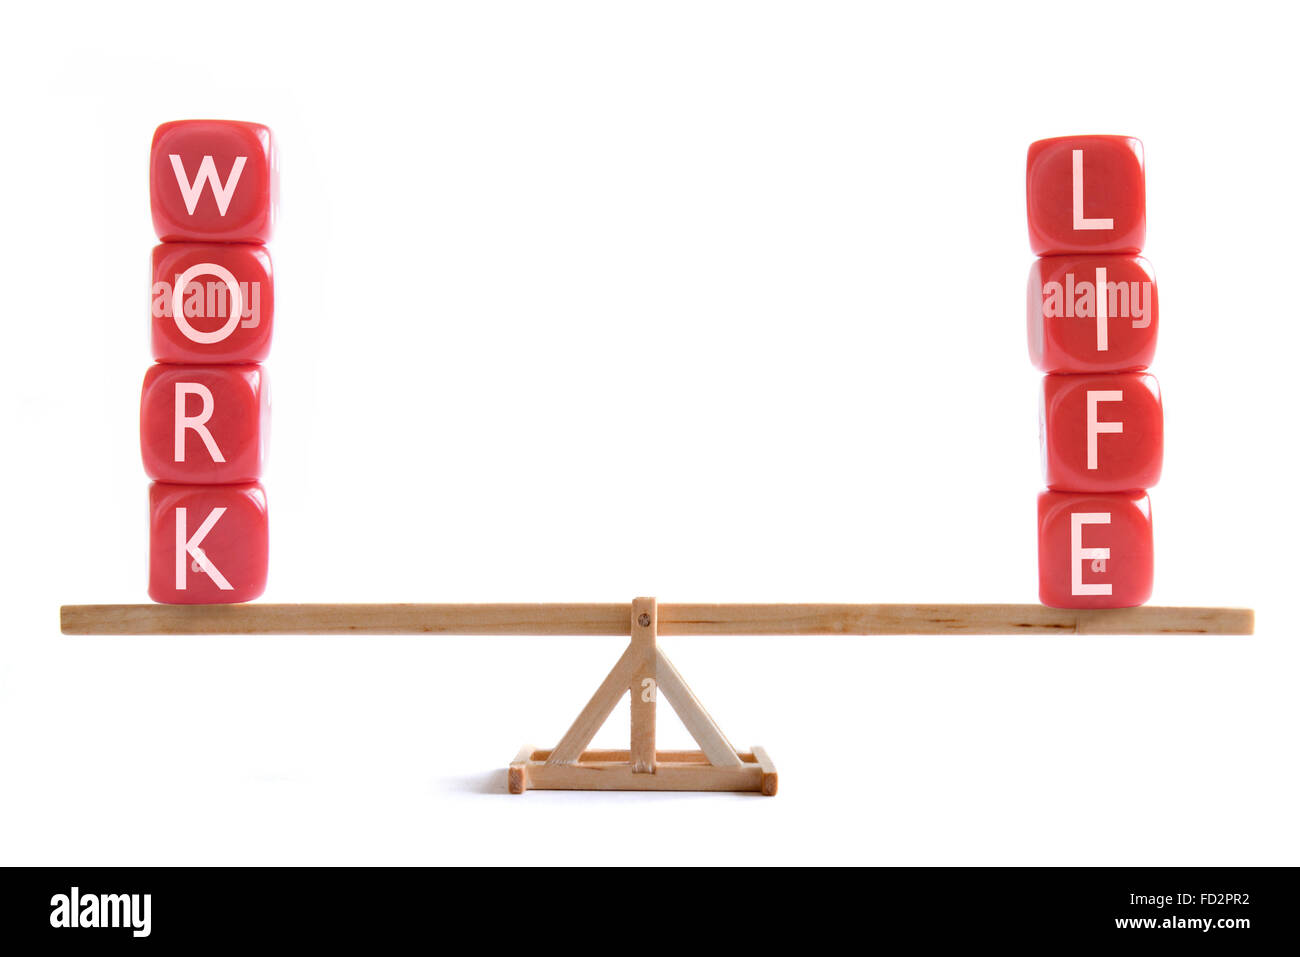 Work life balance concept - Stock Image